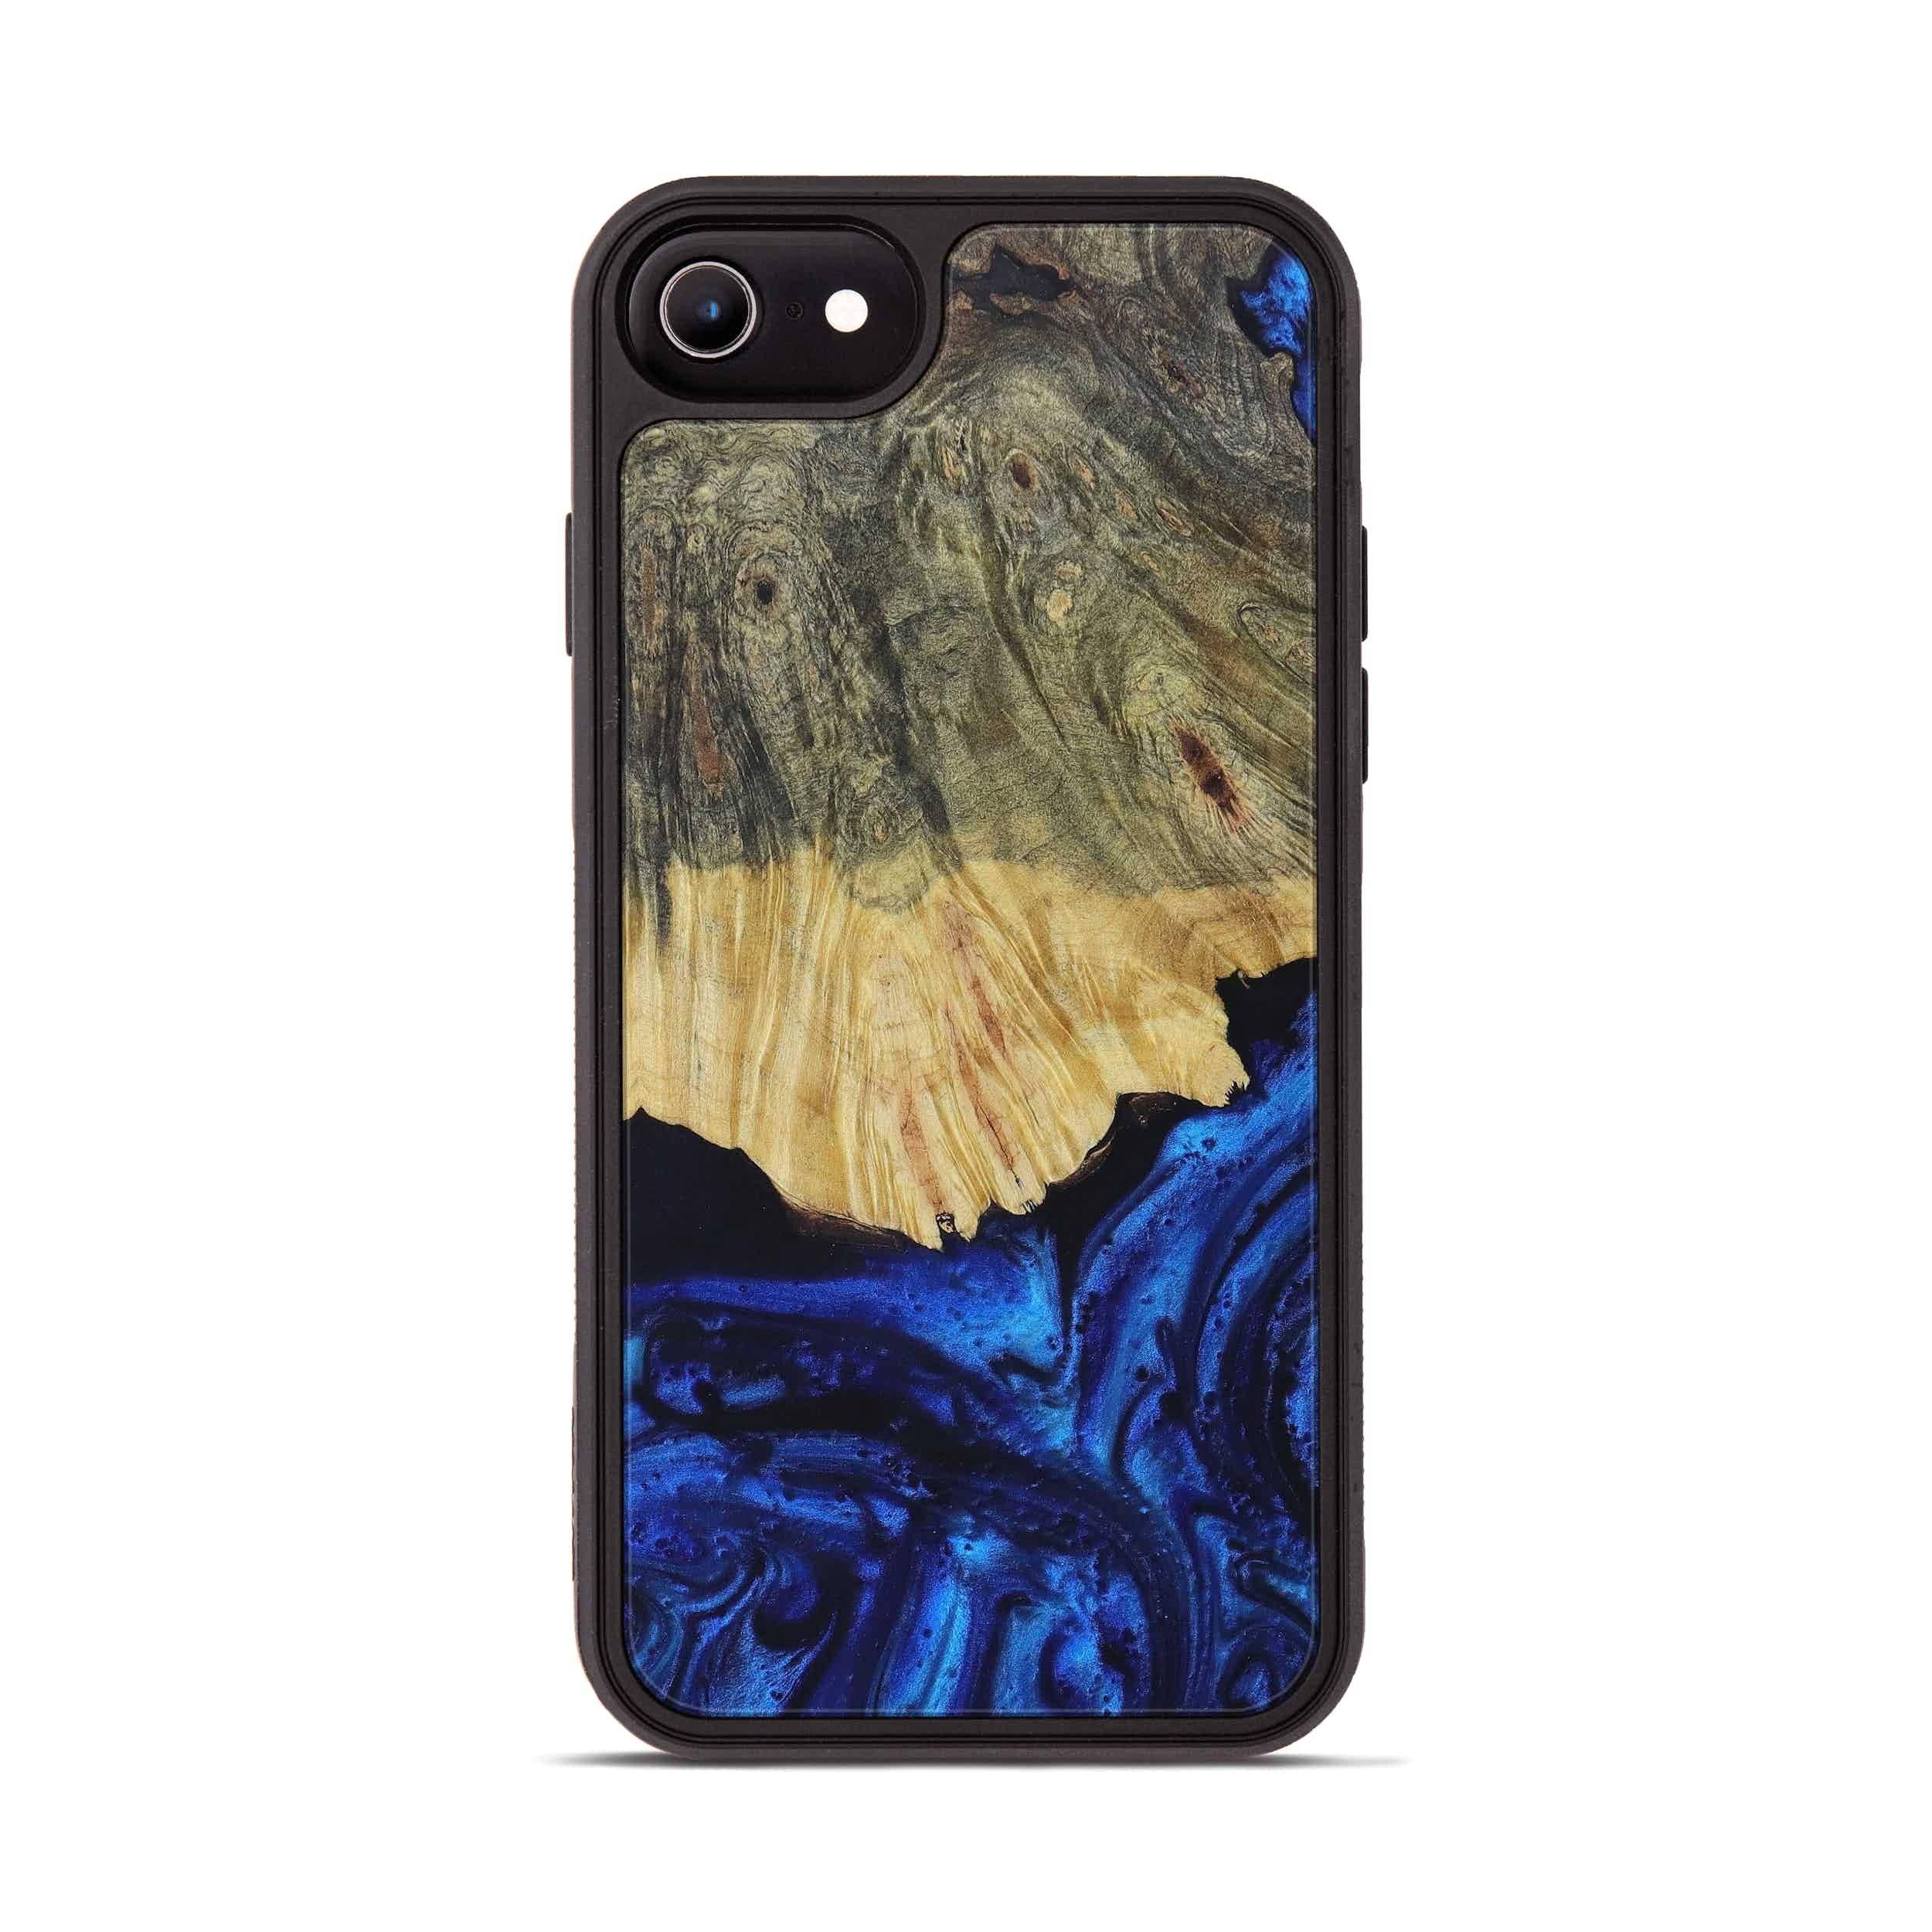 iPhone 7 Wood+Resin Phone Case - Hali (Dark Blue, 399832)